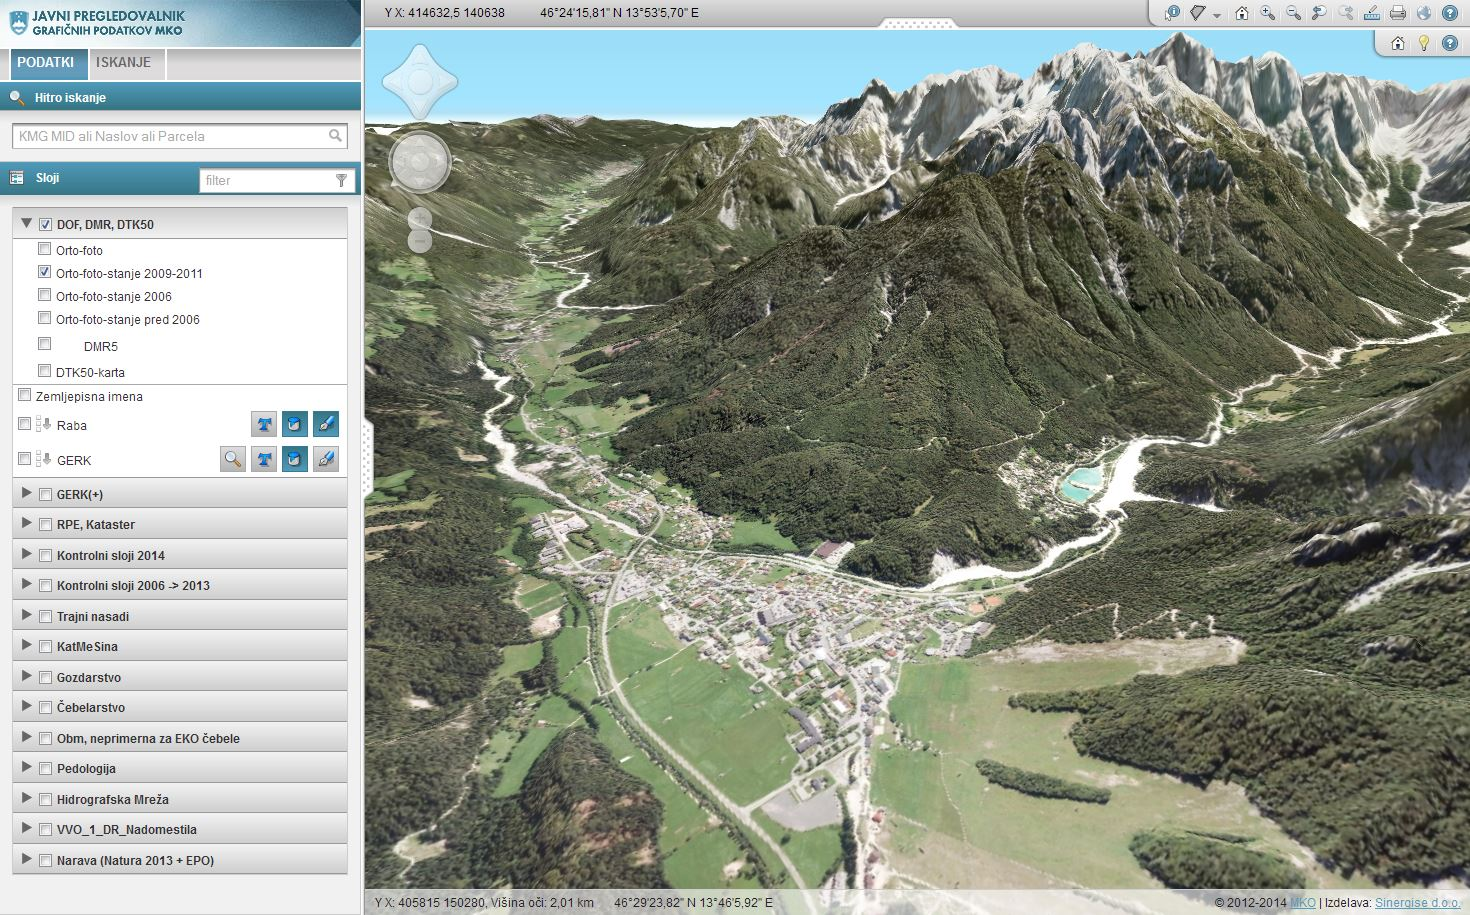 ortofoto karta 3D viewer | Sinergise ortofoto karta